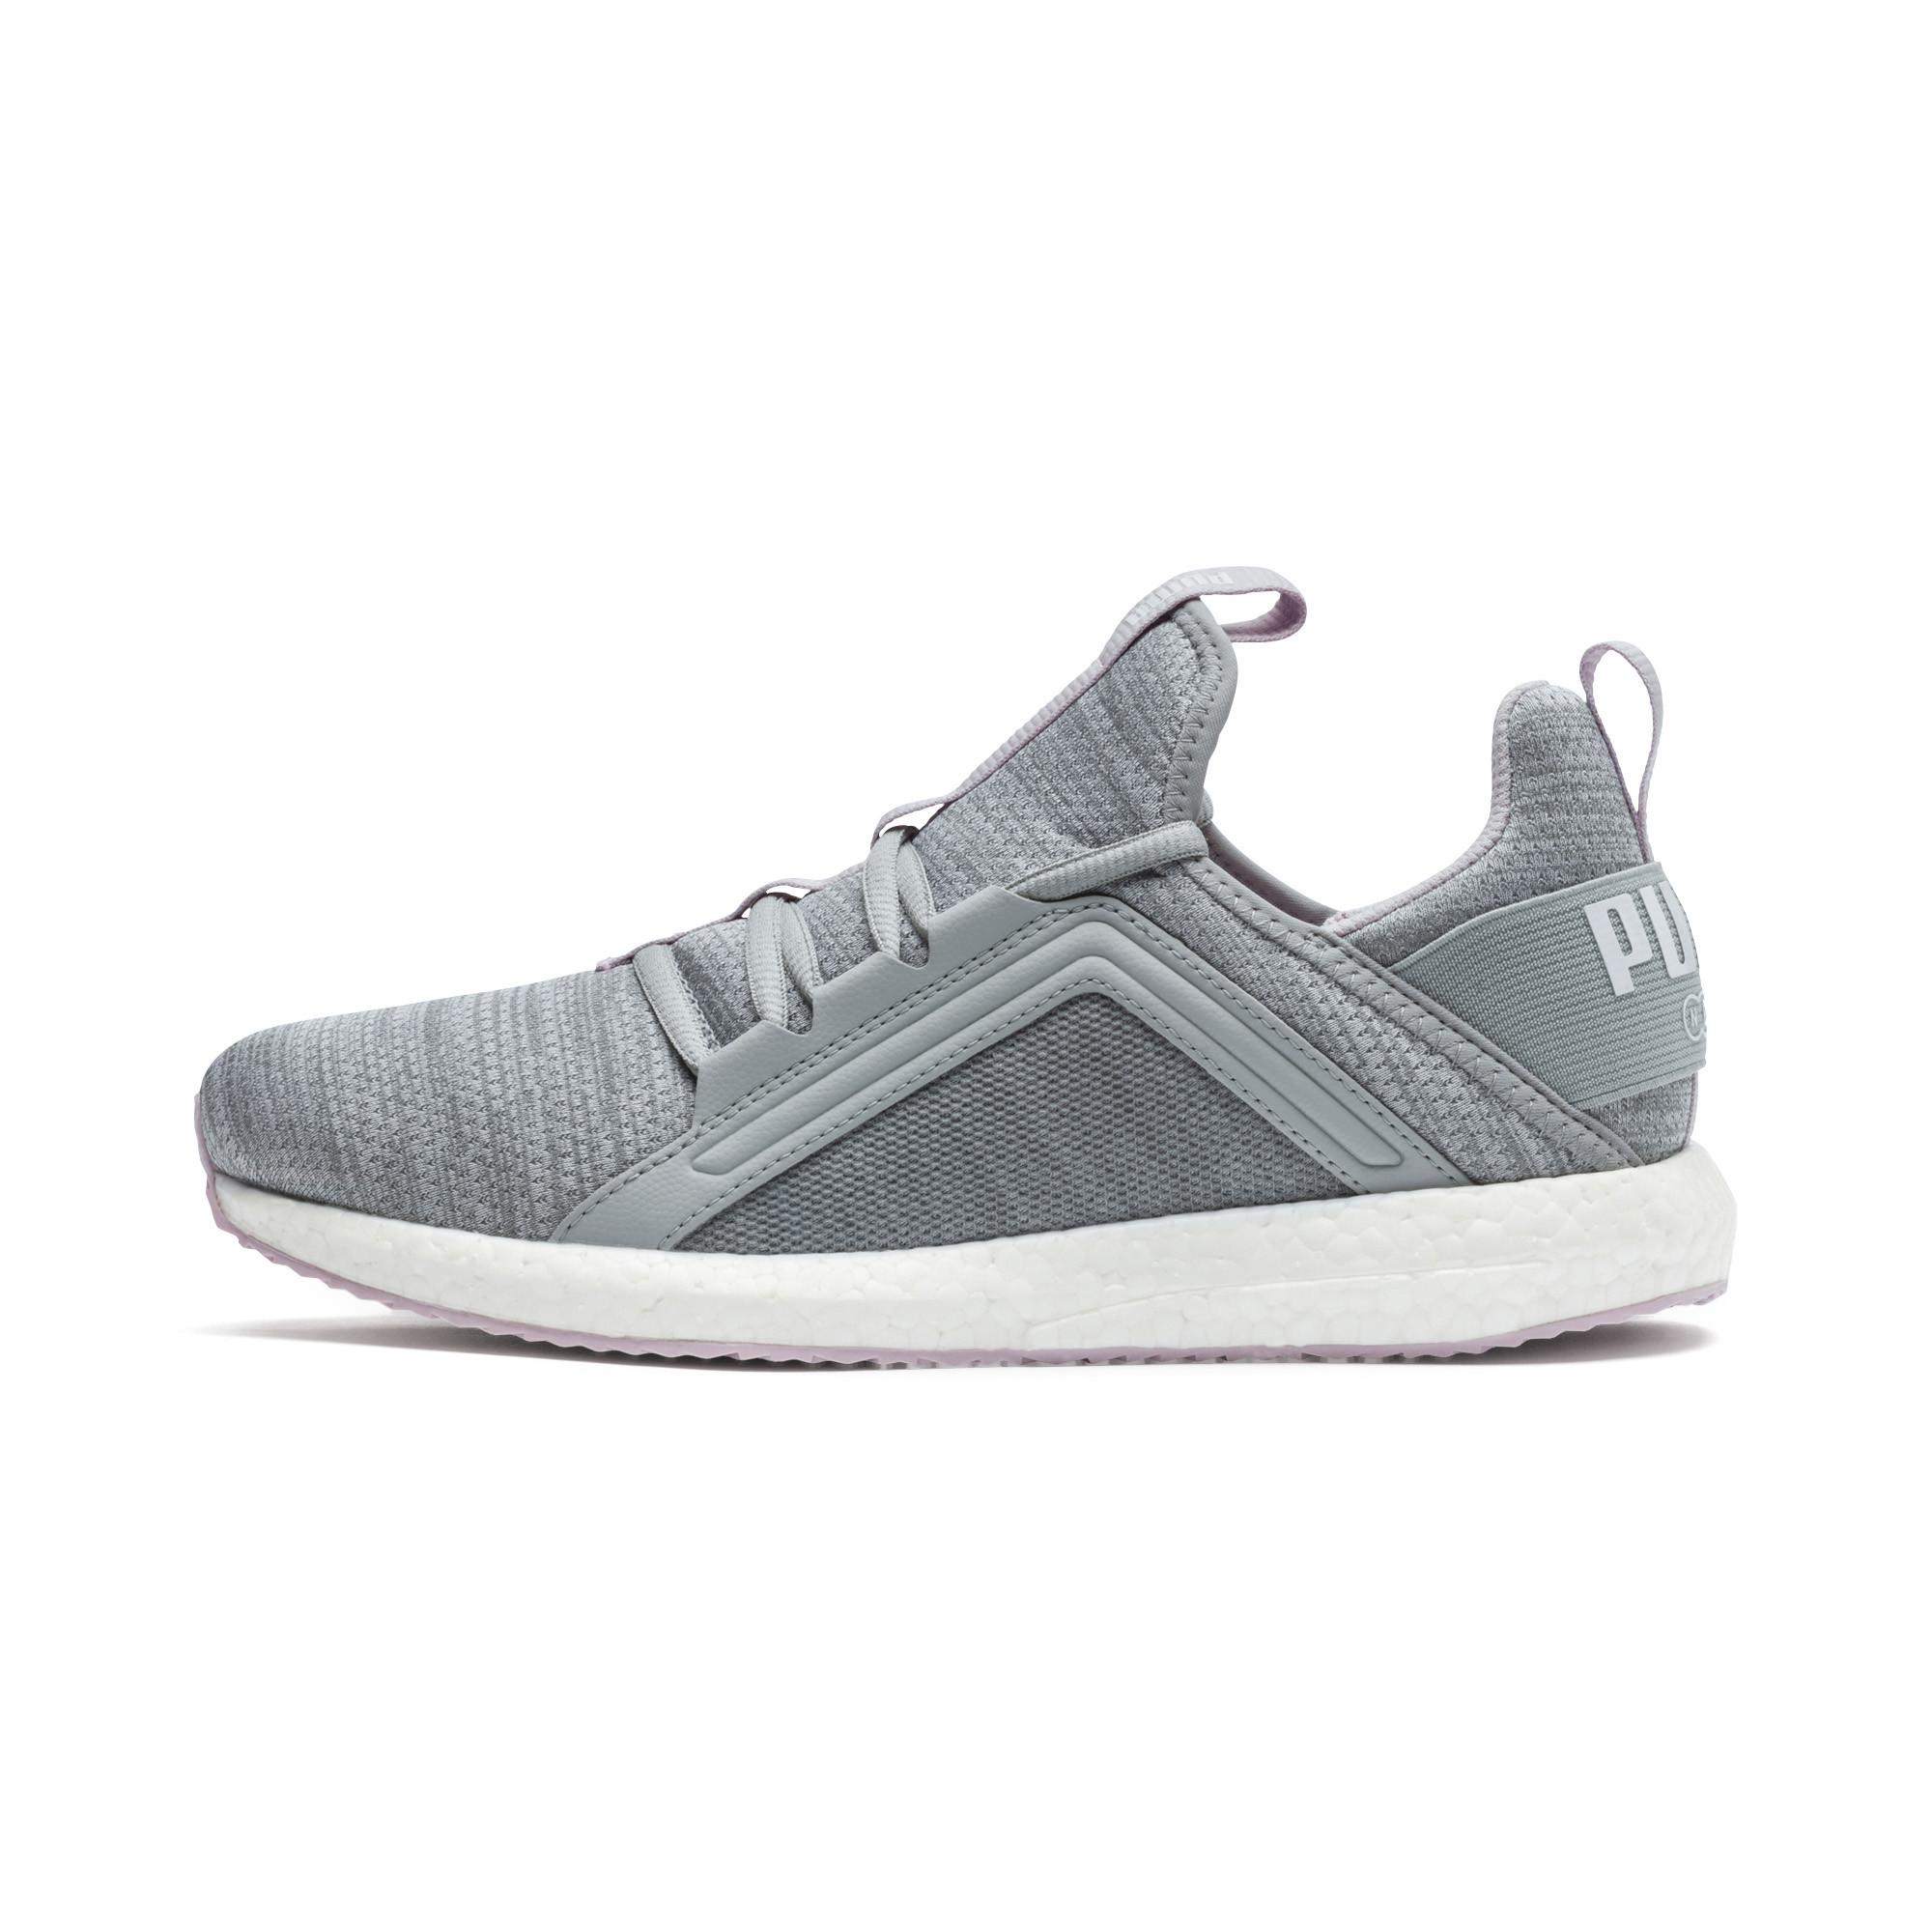 cbc0e449572678 Lyst - PUMA Mega Nrgy Heather Knit Women s Running Shoes - Save 28%